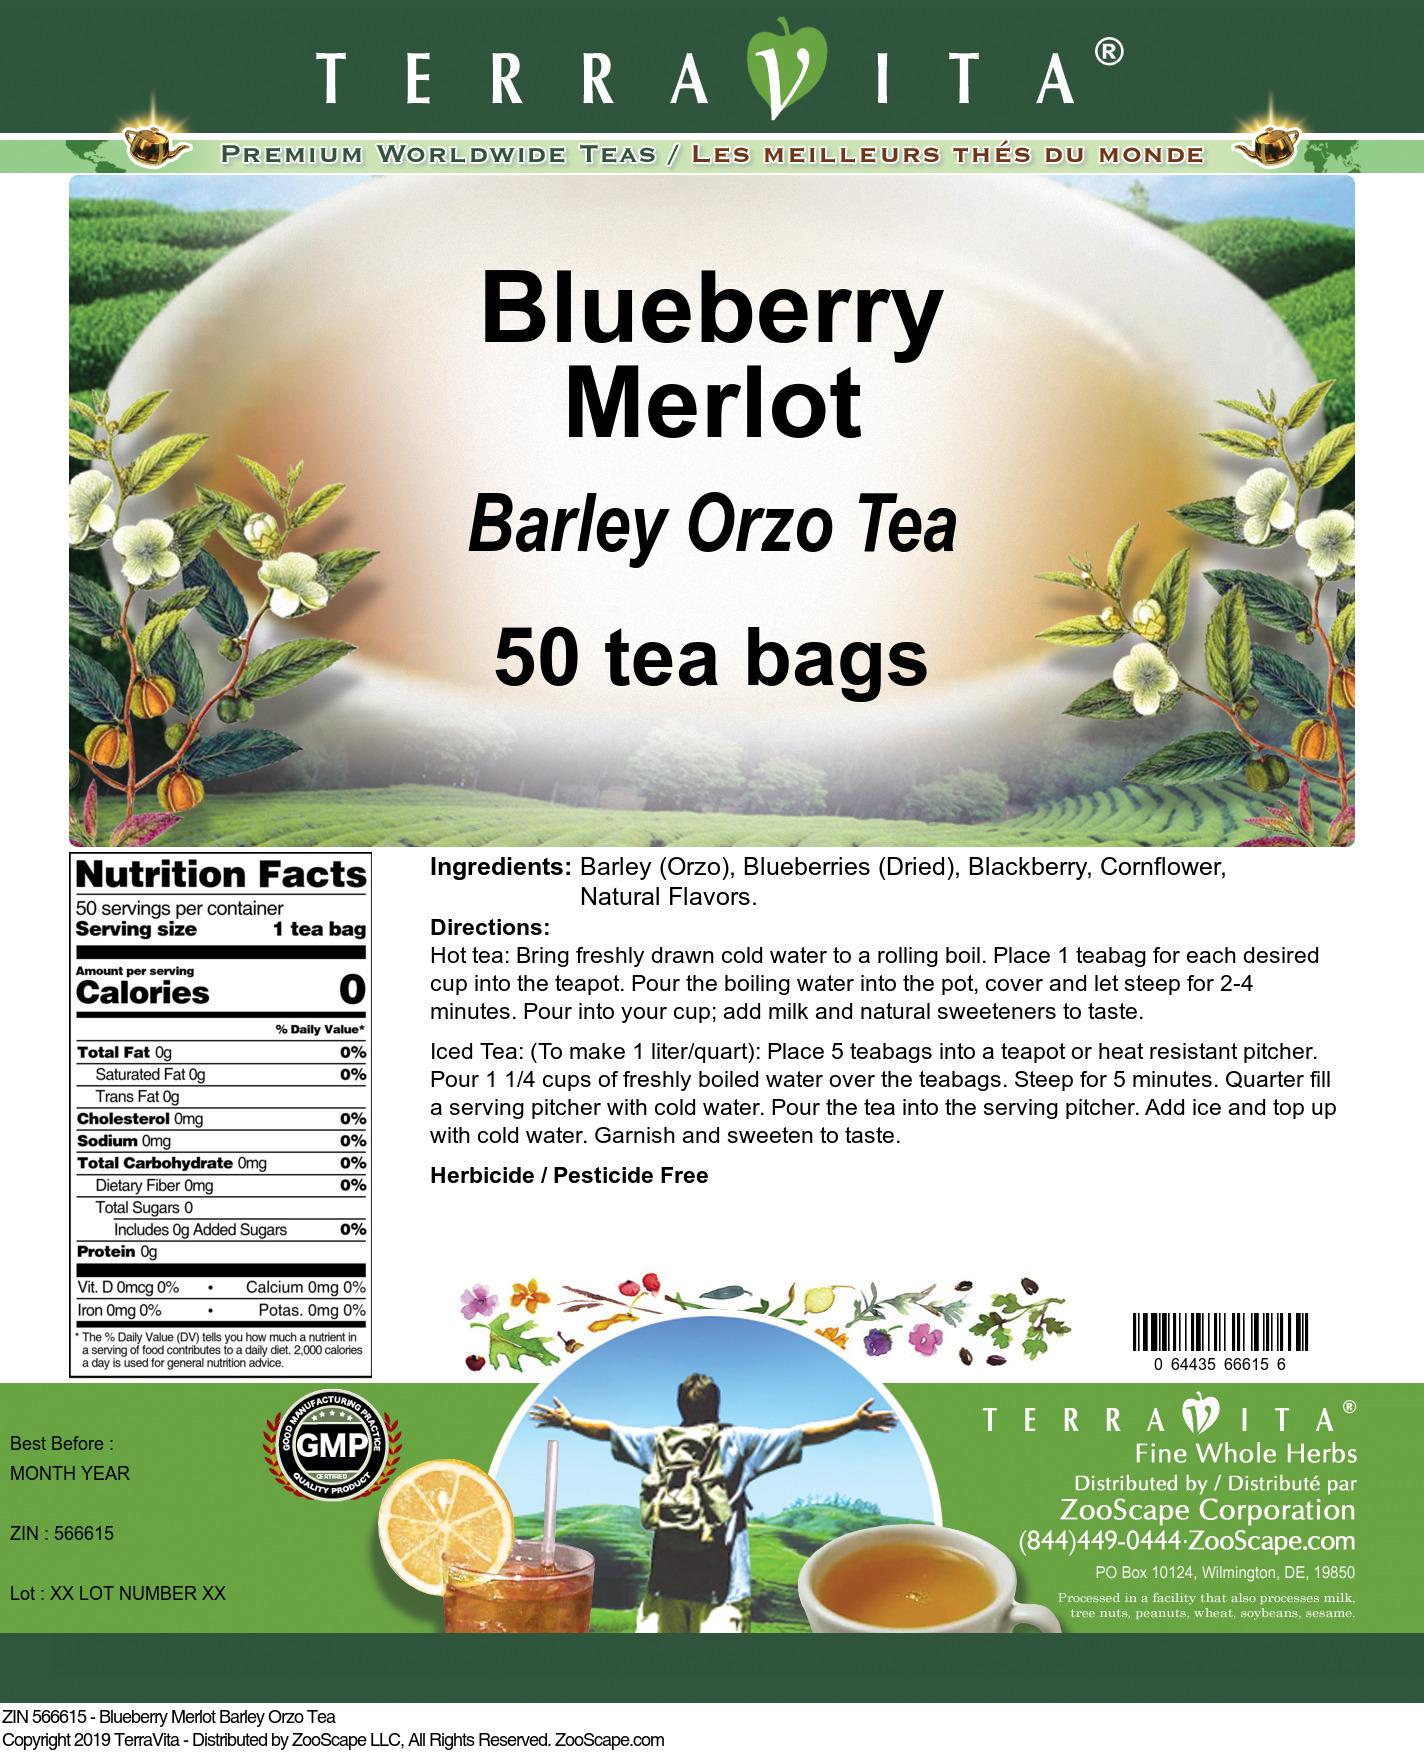 Blueberry Merlot Barley Orzo